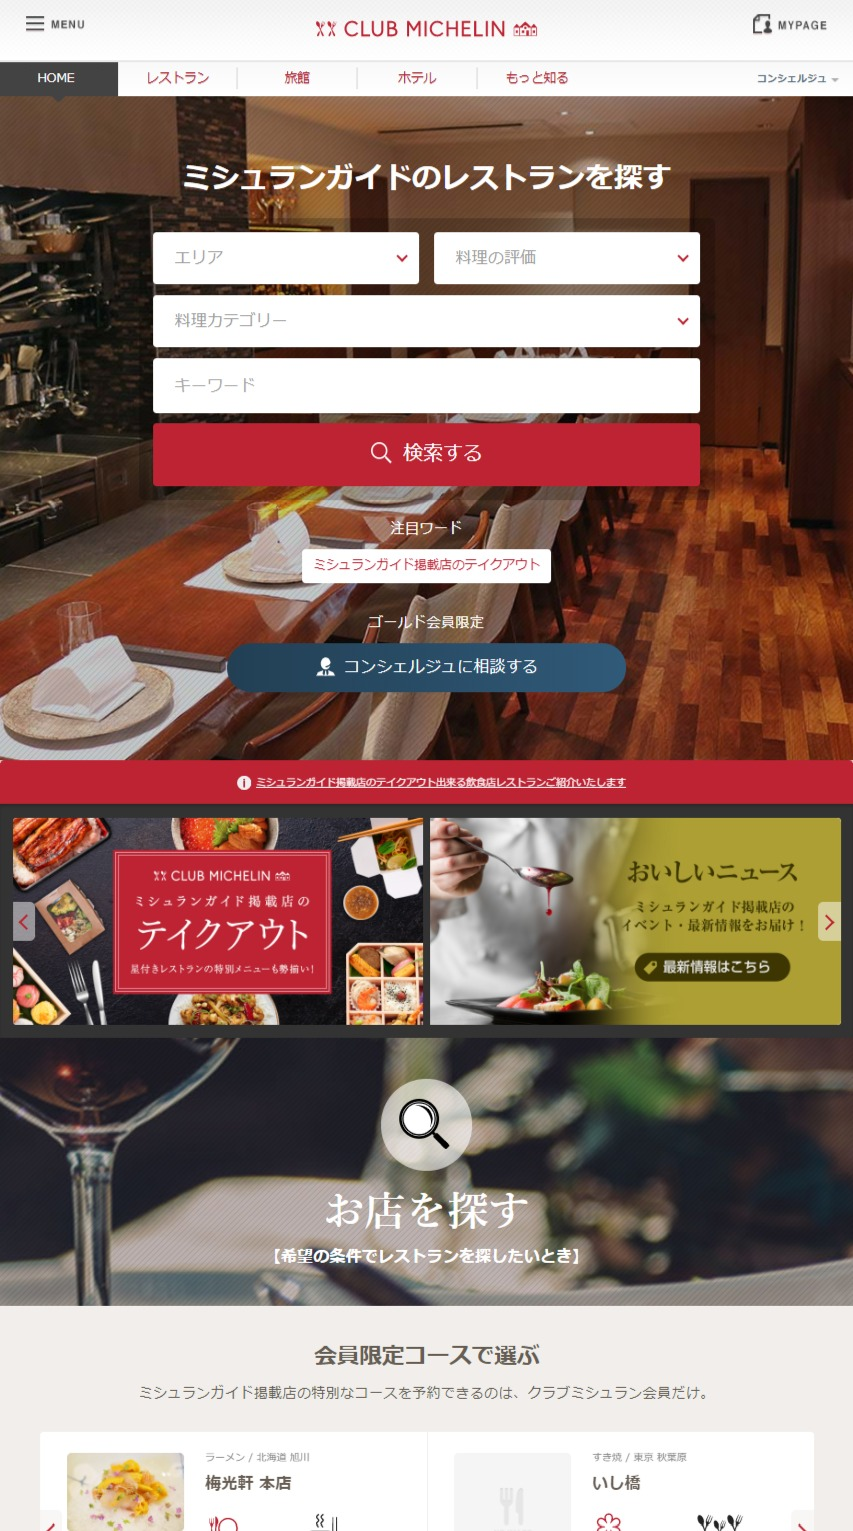 CLUB MICHELIN home page (PC version)